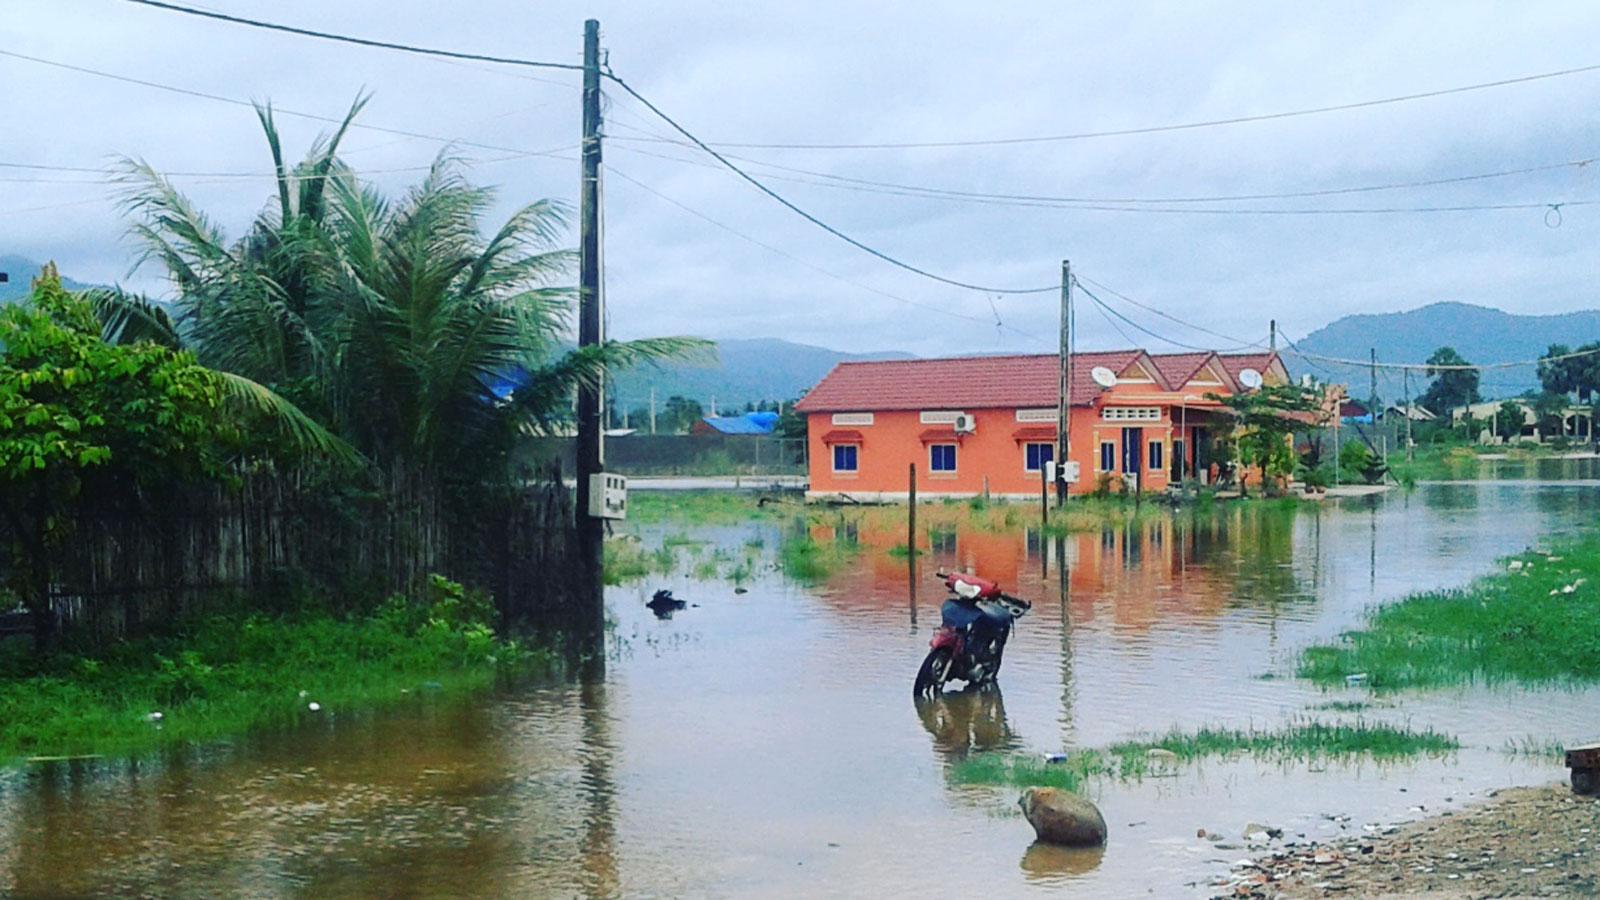 Überflutung in Kampot